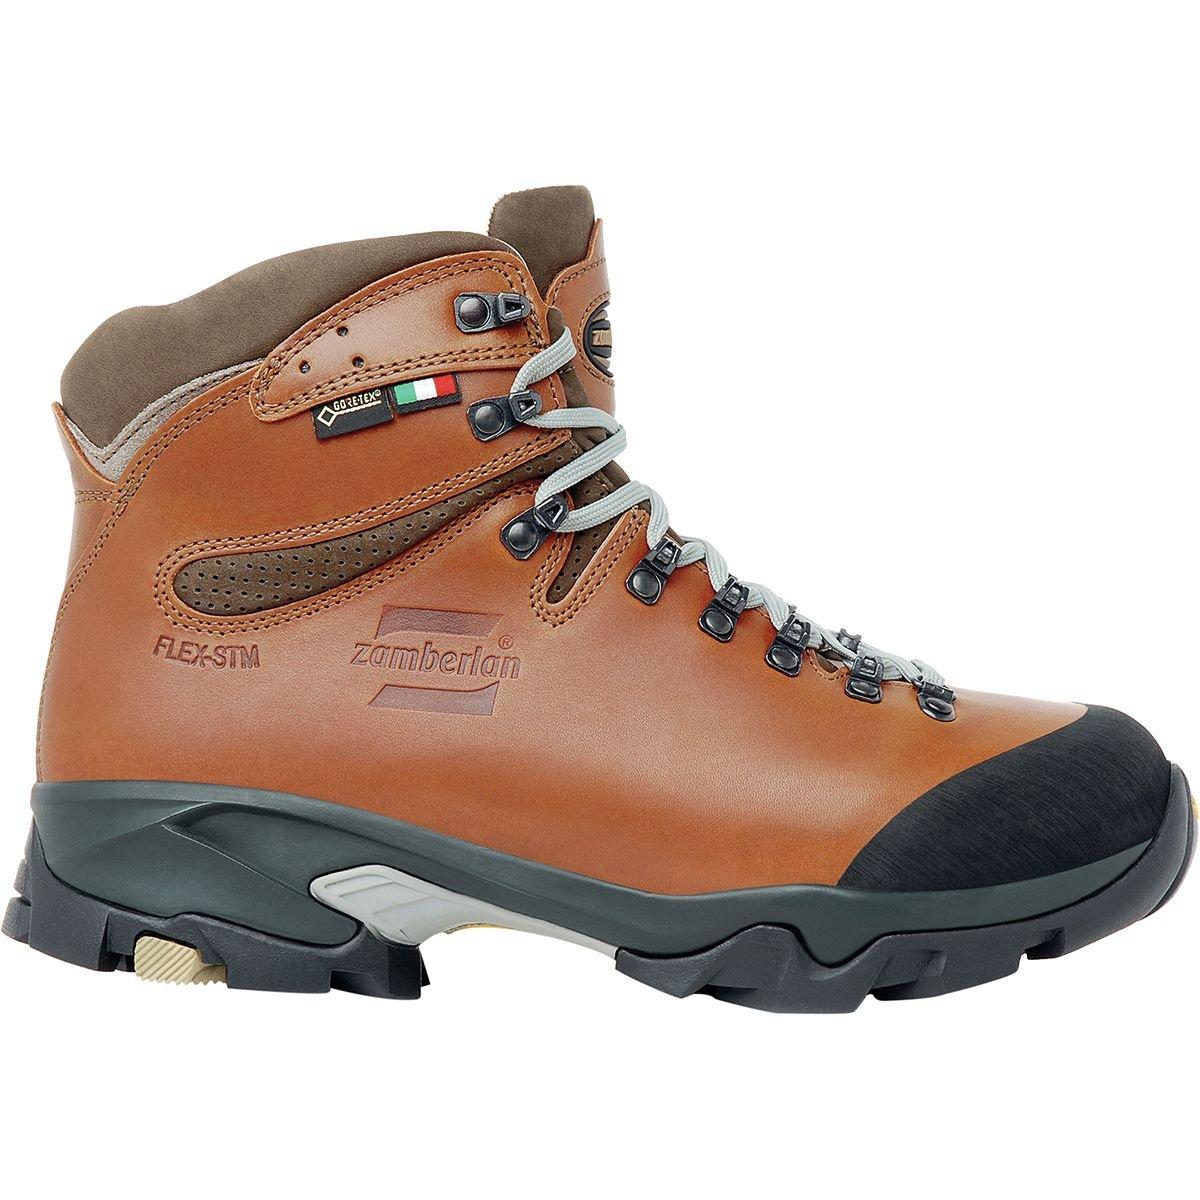 d54d79e3f Zamberlan VIOZ Lux GTX RR Backpacking Boot - Men's (9.5 UK M): Buy ...